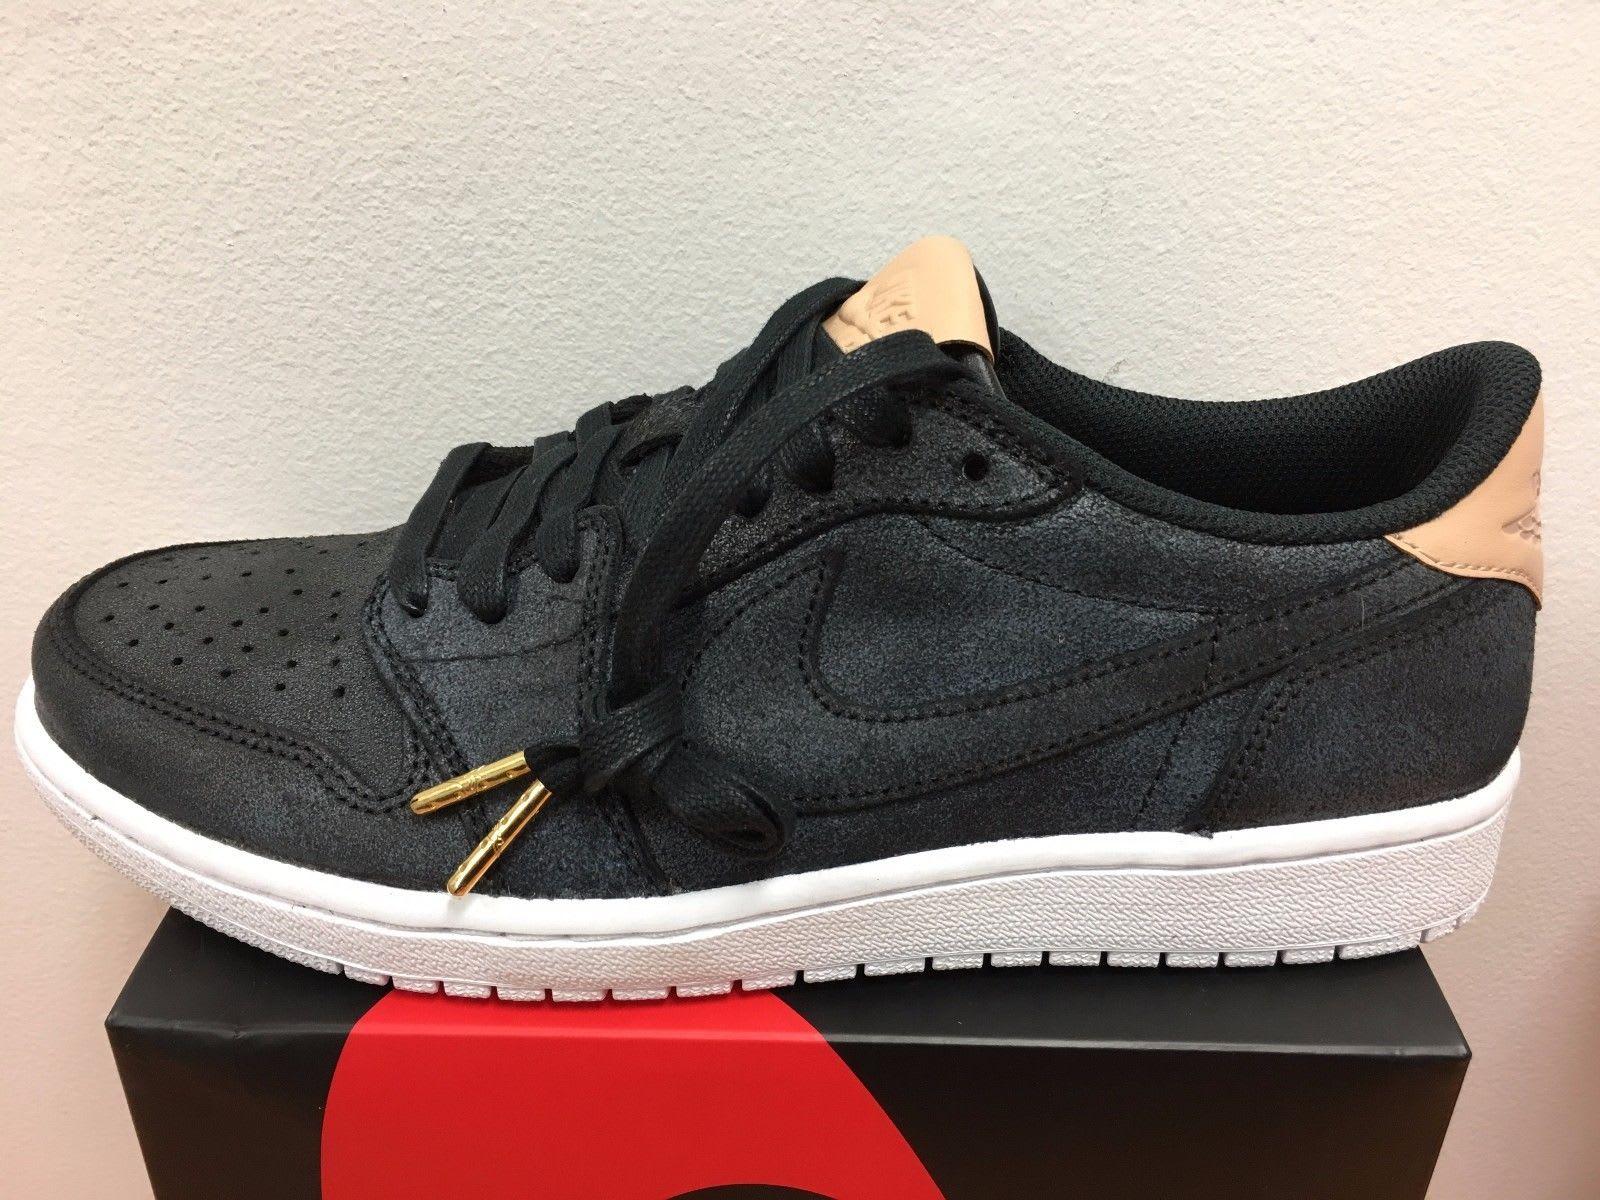 half off aaa17 1ff5c nike air jordan 31 low cut basketball shoes black light blue